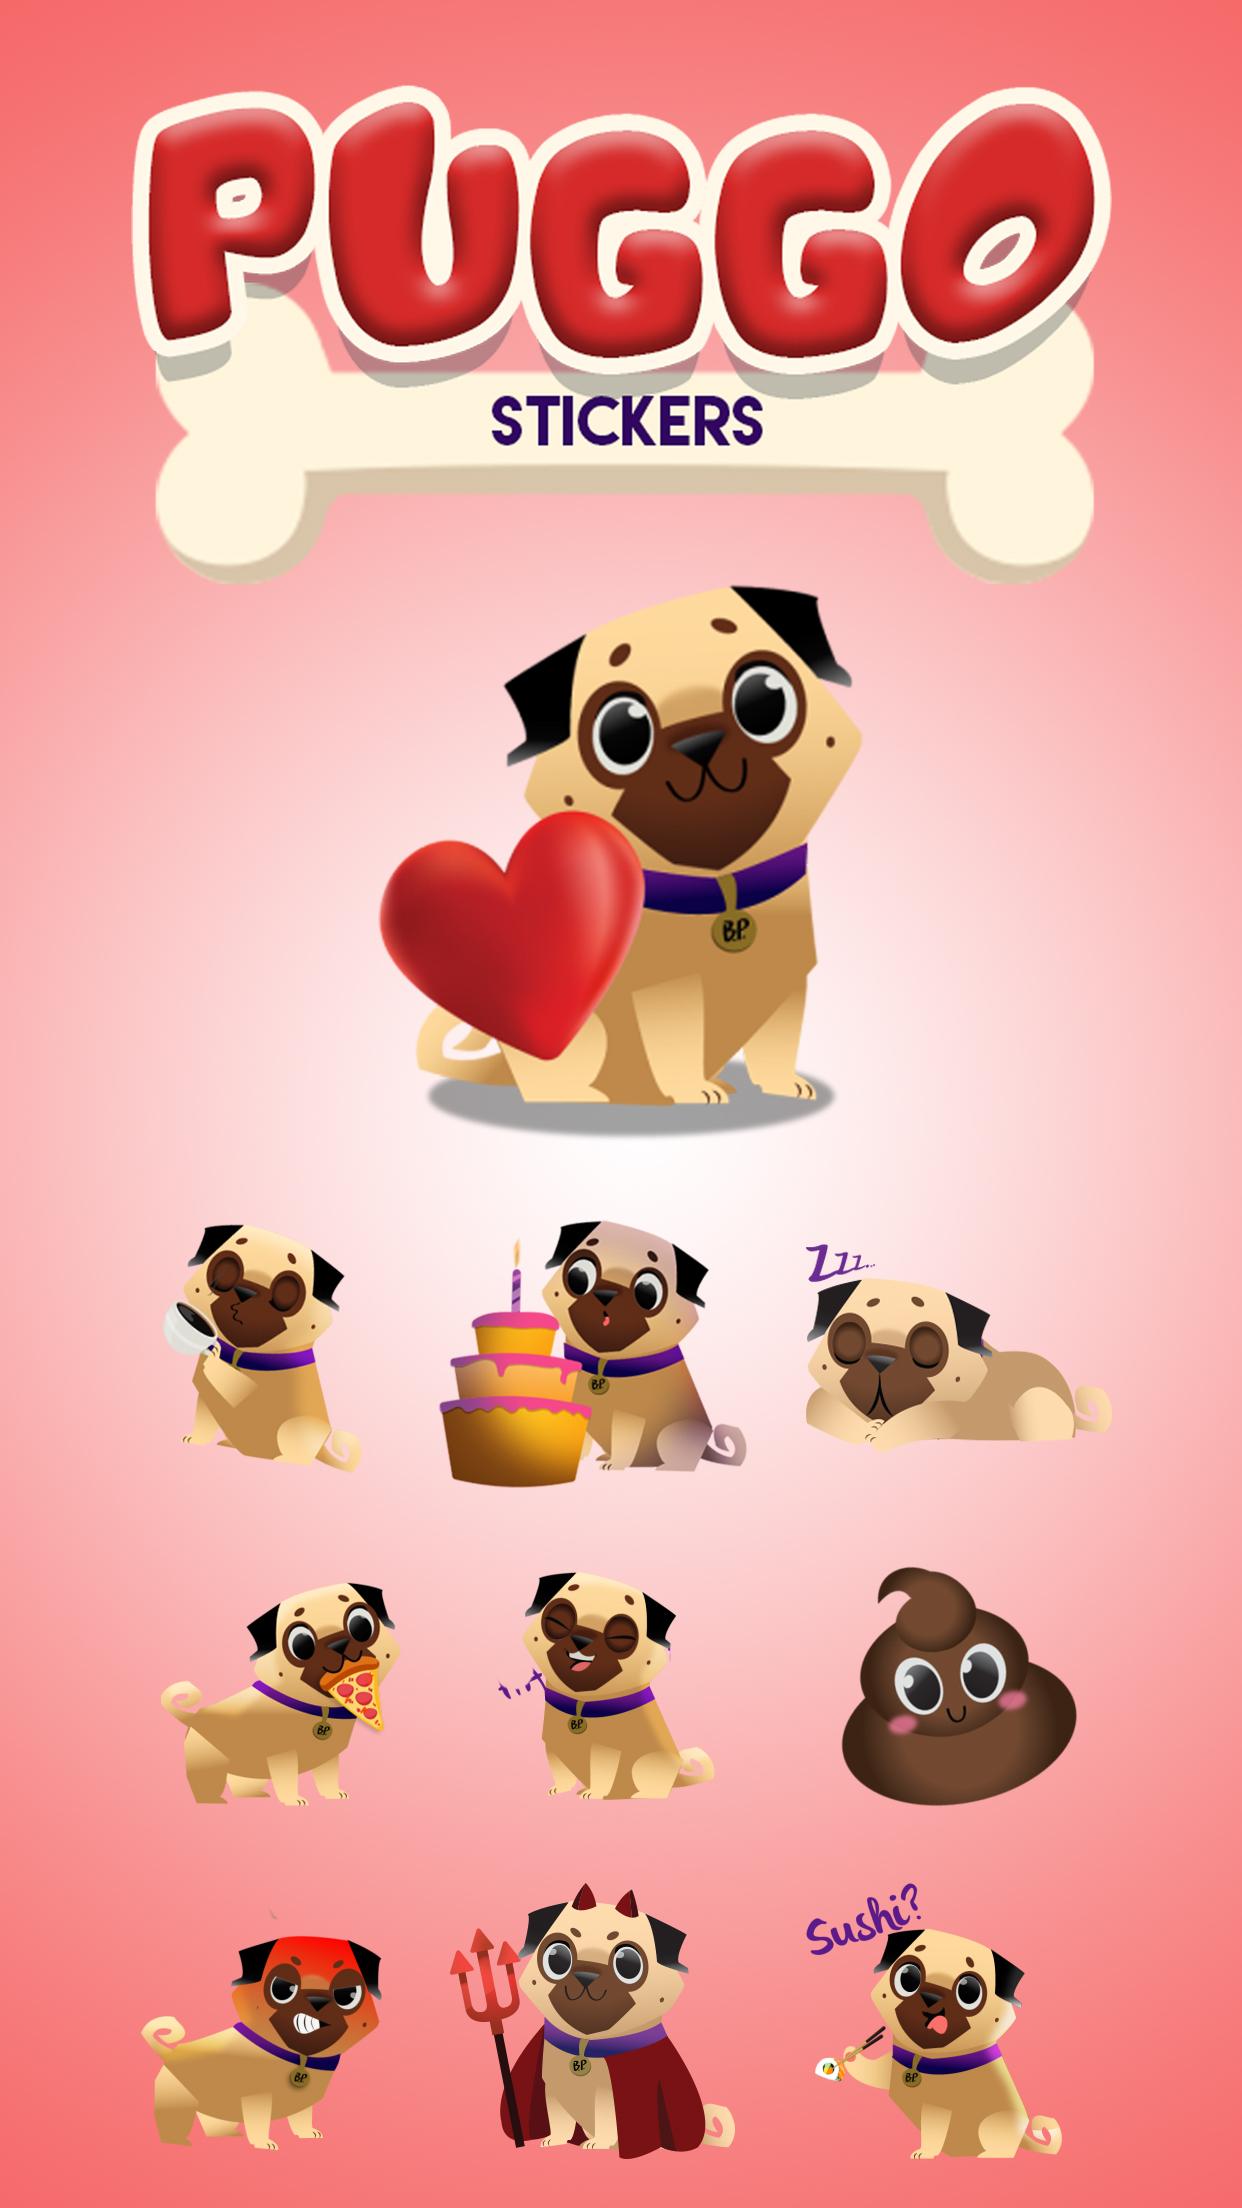 Puggo Stickers - Animated